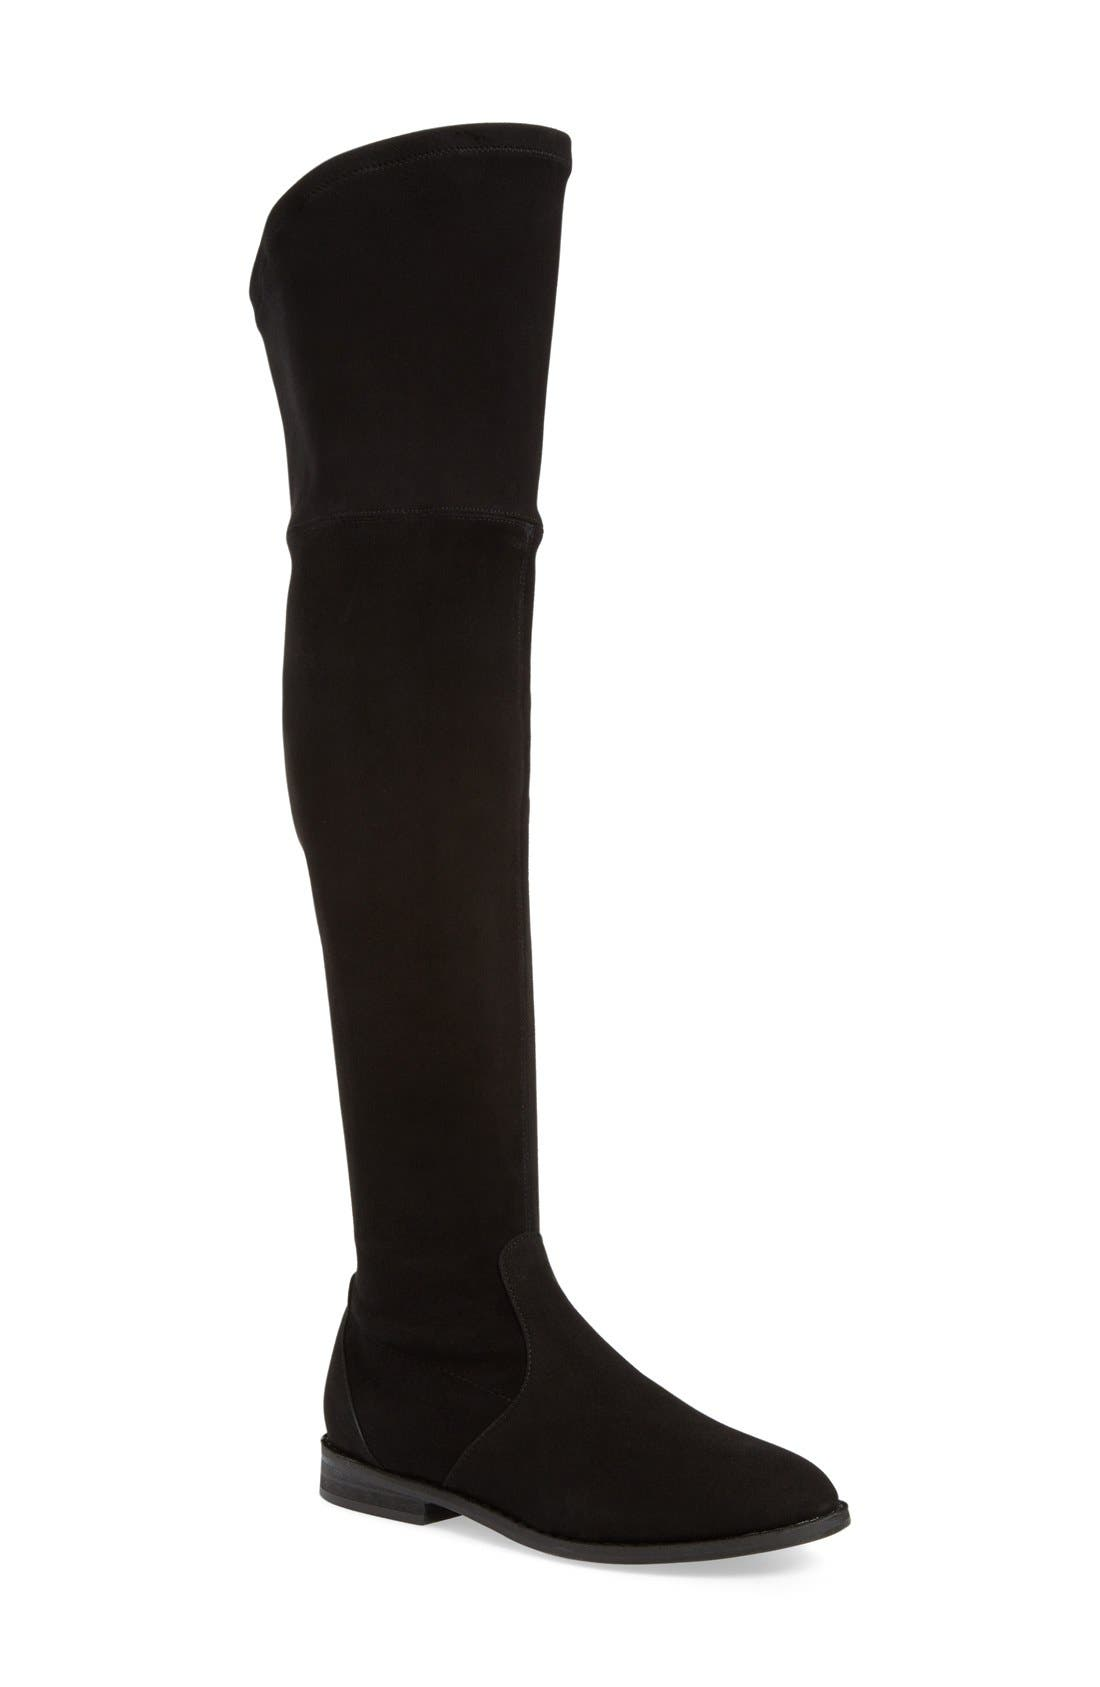 Main Image - Gentle Souls 'Emma' Over the Knee Boot (Women) (Narrow Calf)